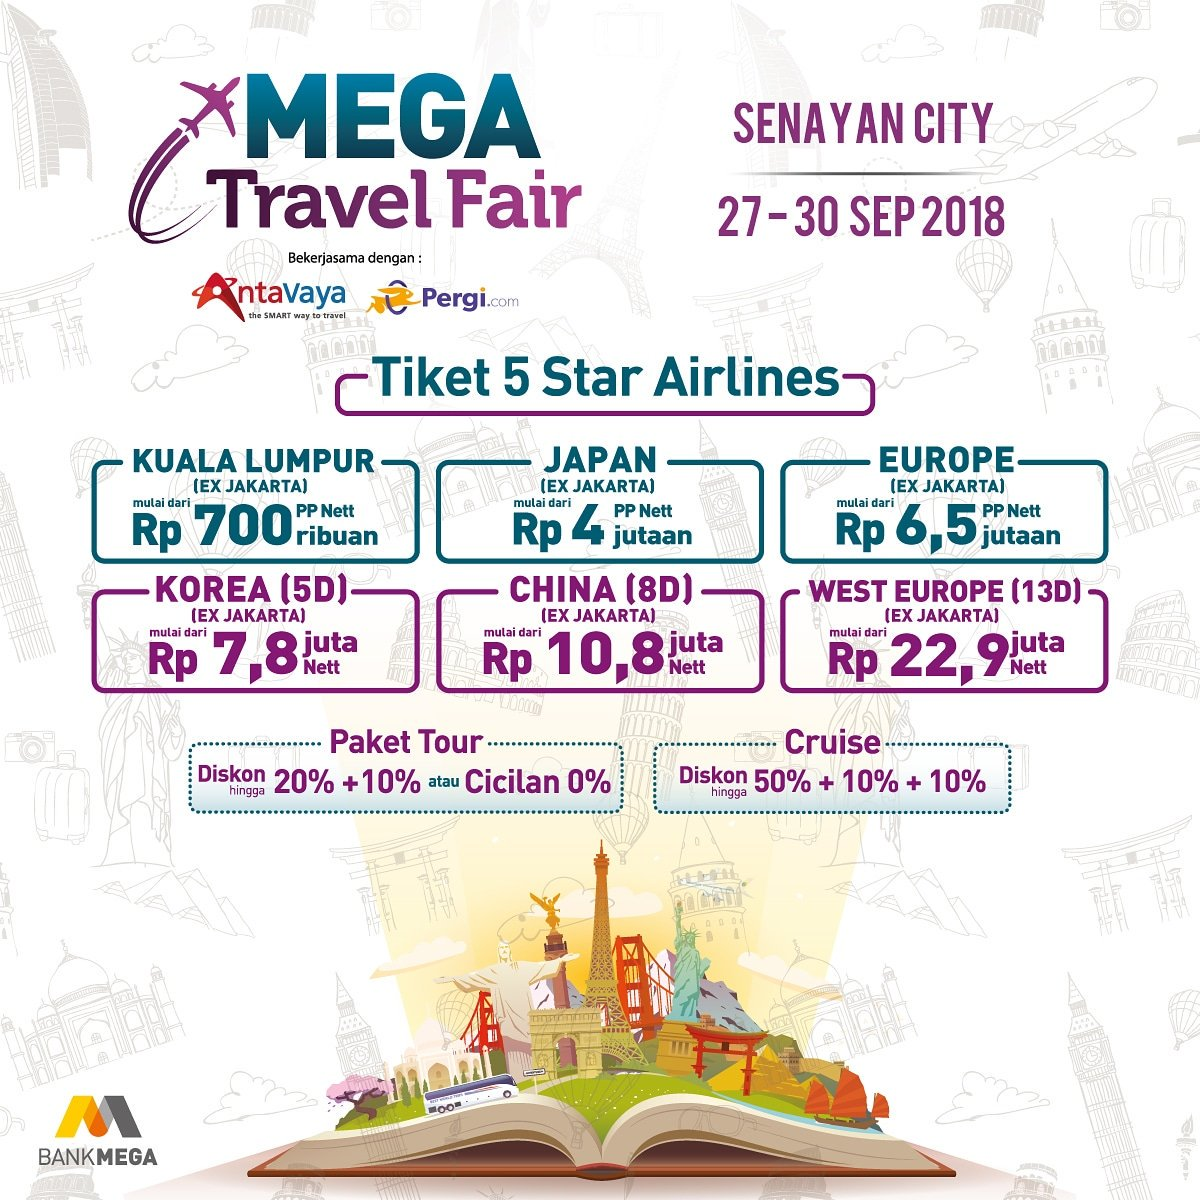 Bank Mega - Event Mega Travel Fair Jakarta & Bandung (27 - 30 Sept 2018)